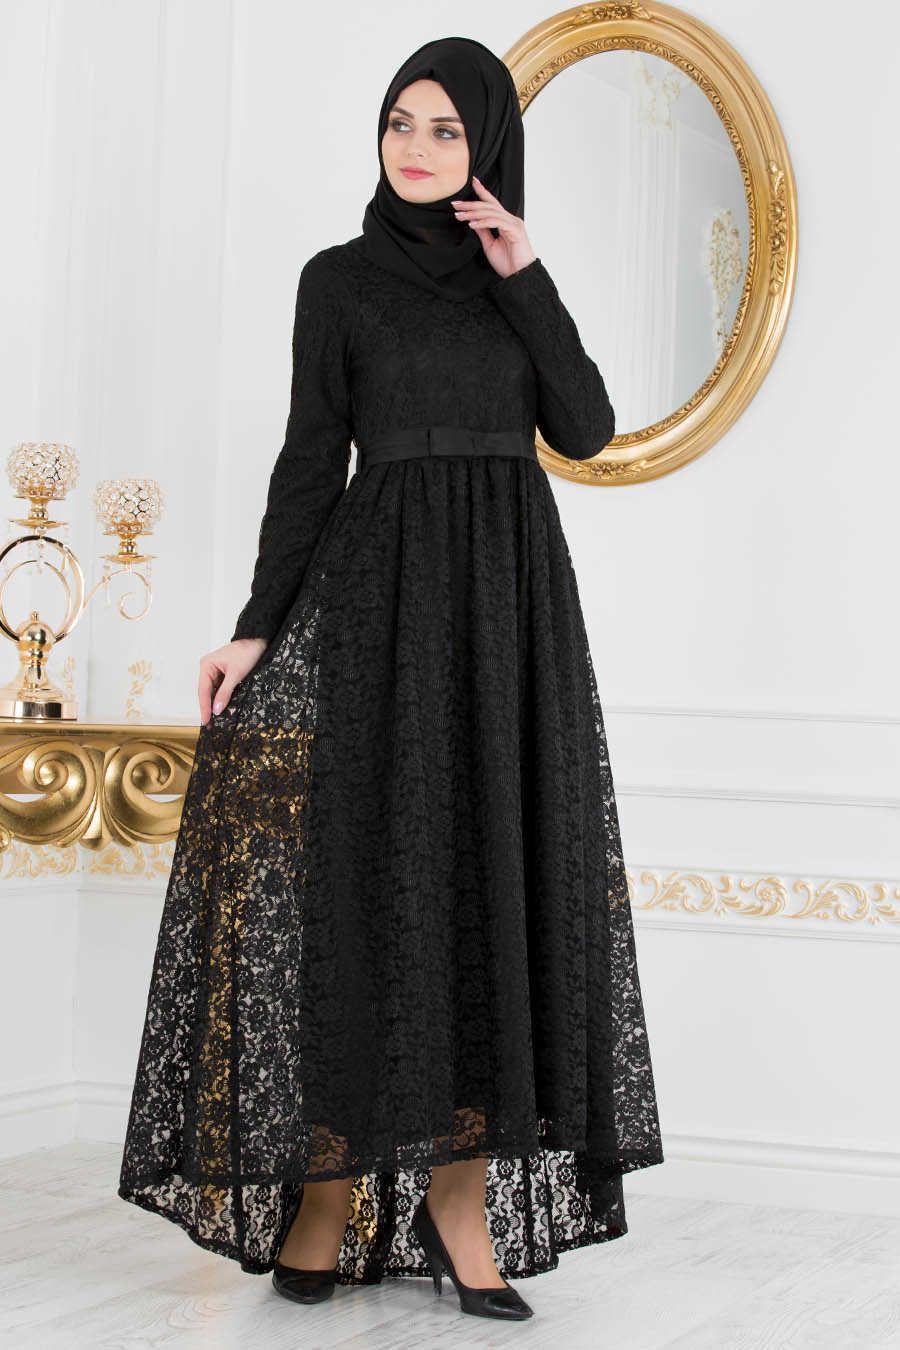 Neva style black hijab evening dress s evening dress